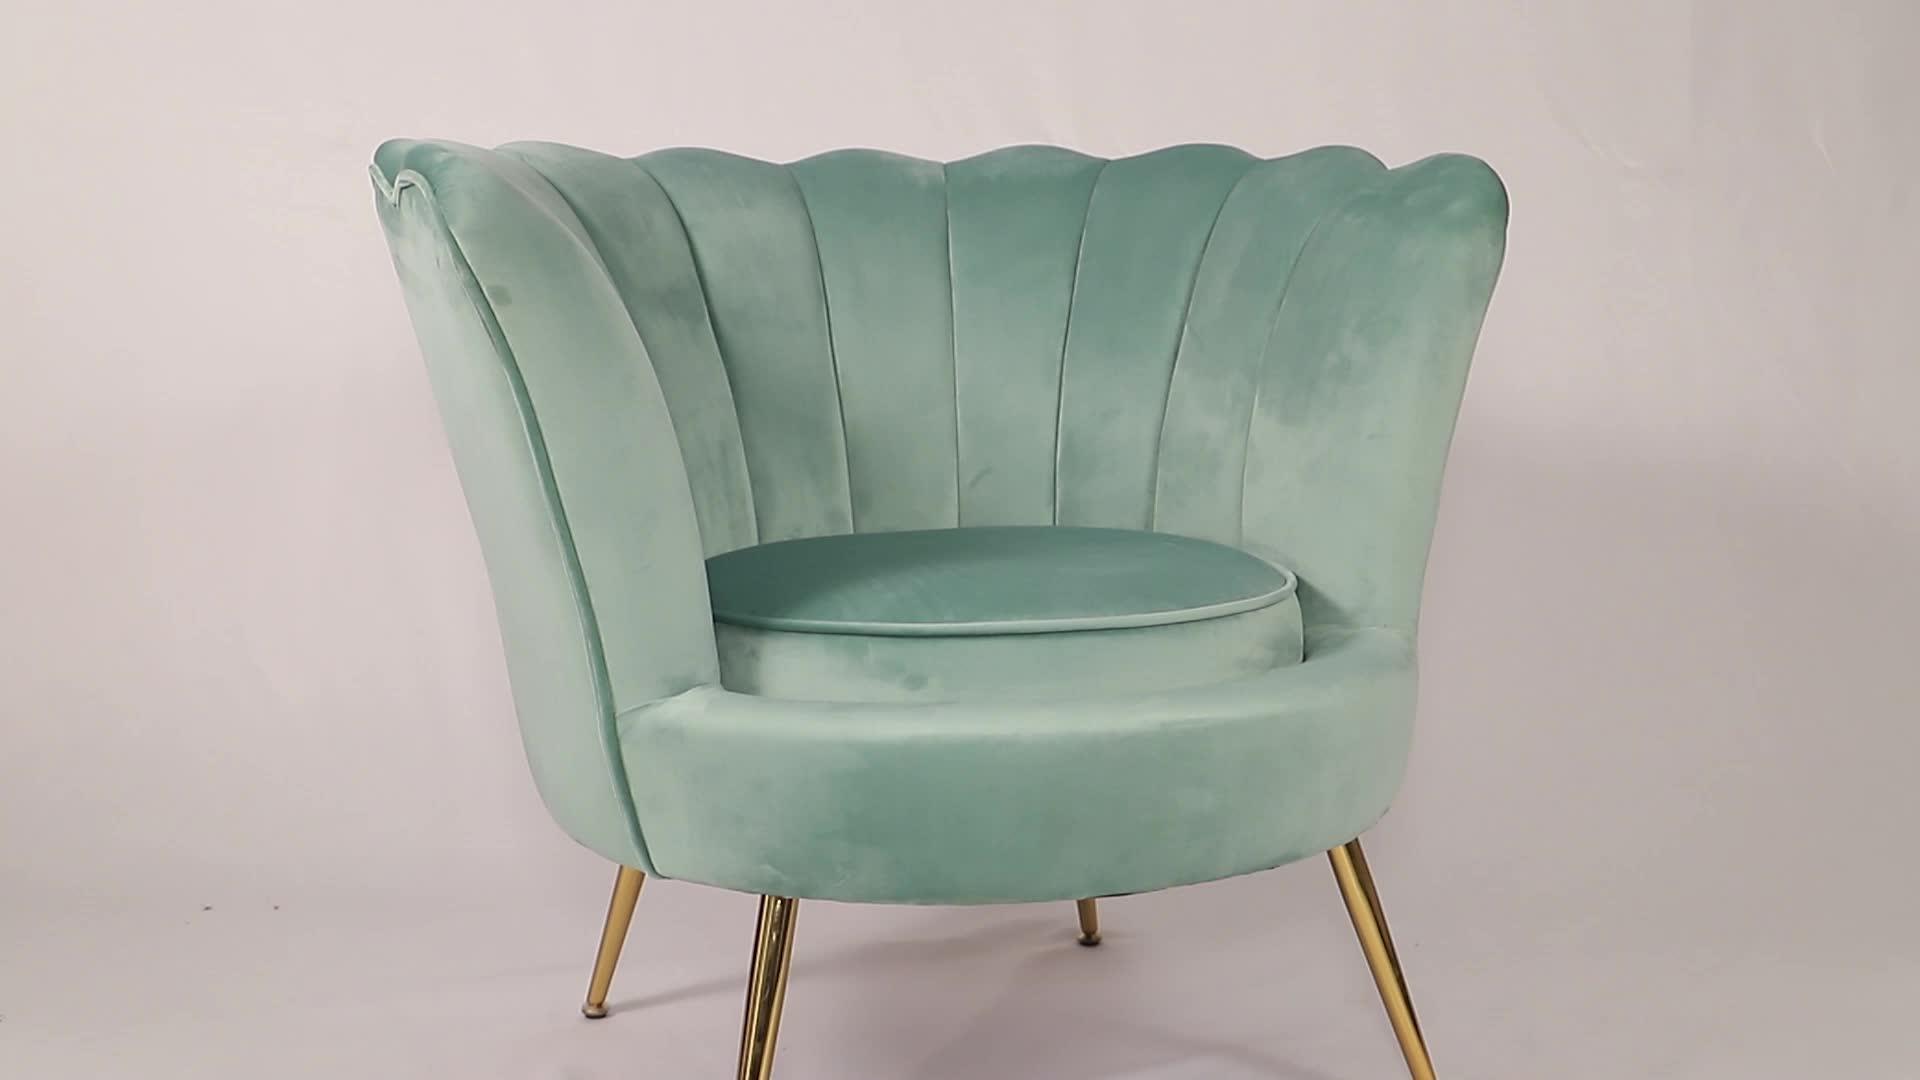 Amazon Hot Sales royal  Luxury Upholstered Velvet Floral Loveseat sofa with Metal Legs